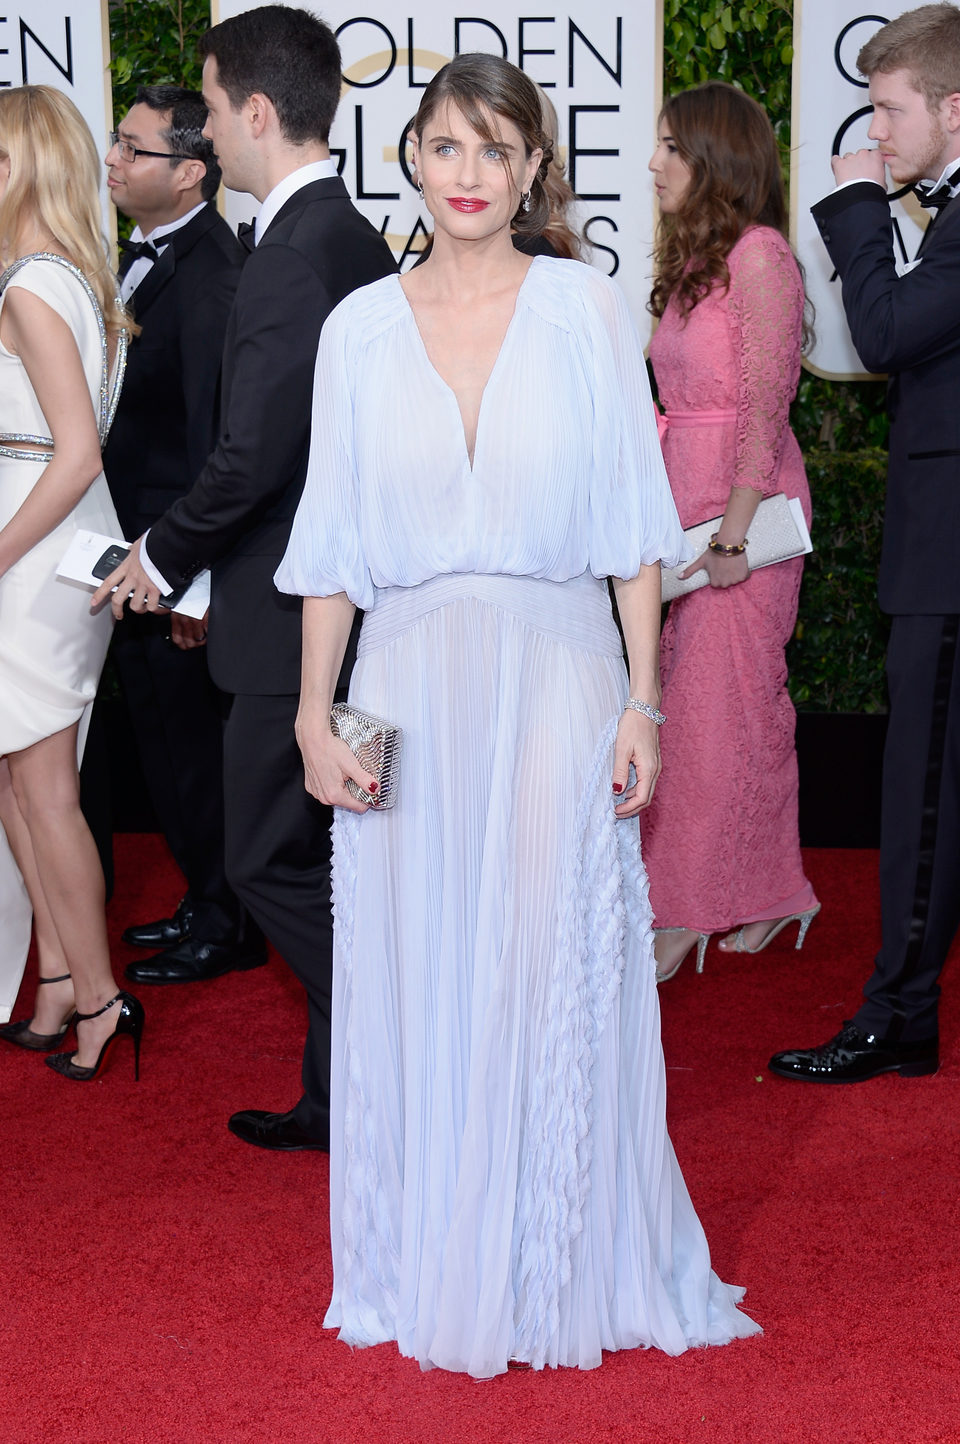 Amanda Peet at the Golden Globes 2015 red carpet